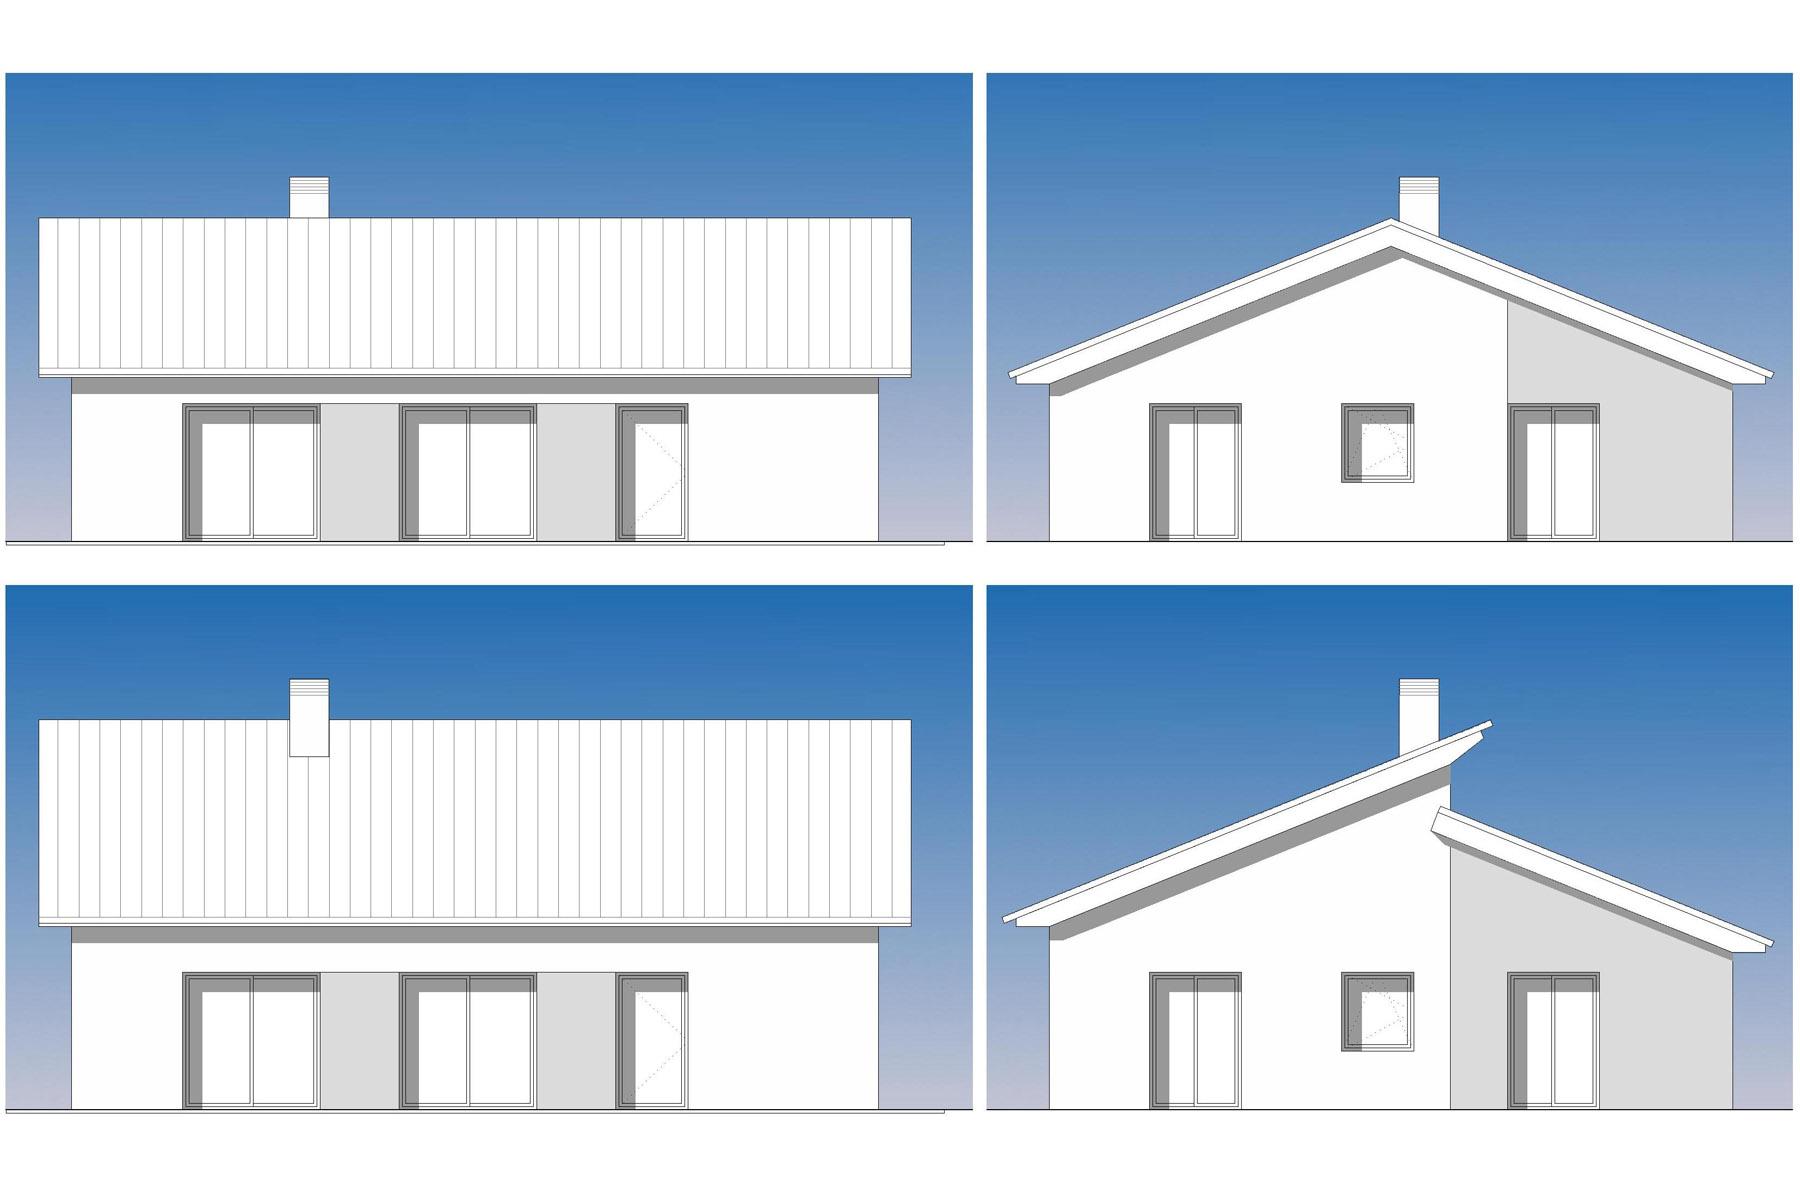 Casa-Sales-Prefabricated-Single-Family-House-Sales-de-Llierca-Girona-01